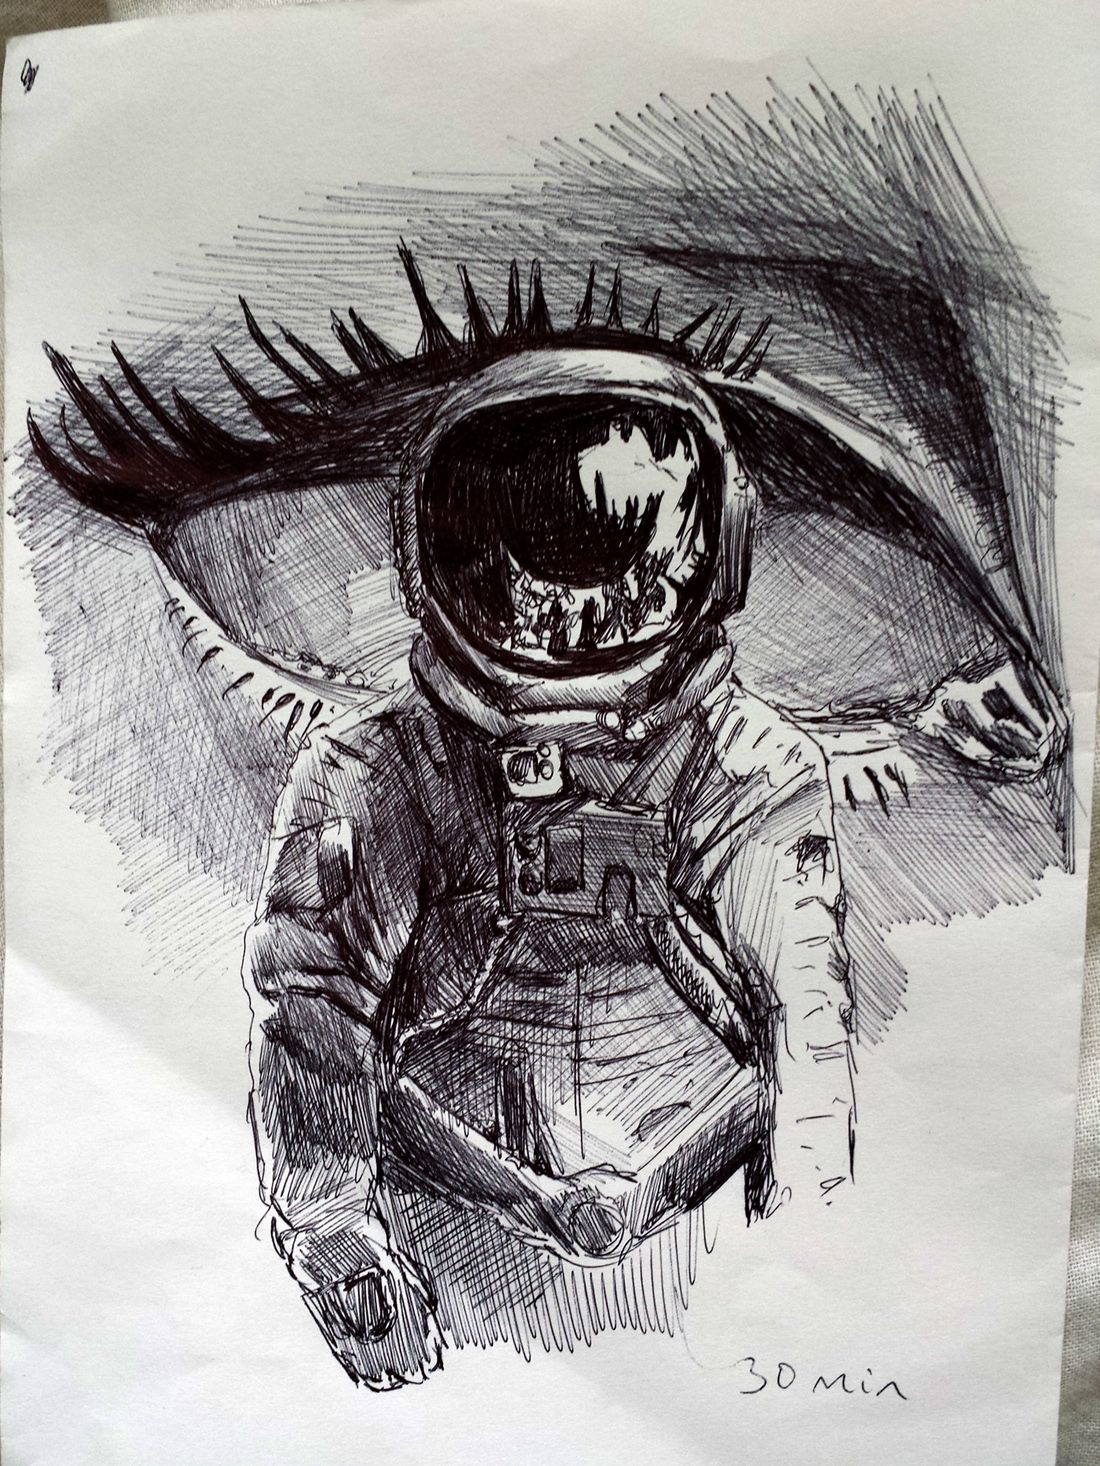 Hipster Art. Astronuta Ojo Lapiz. Dibujo Creativo Inspiracion Surrealismo Art